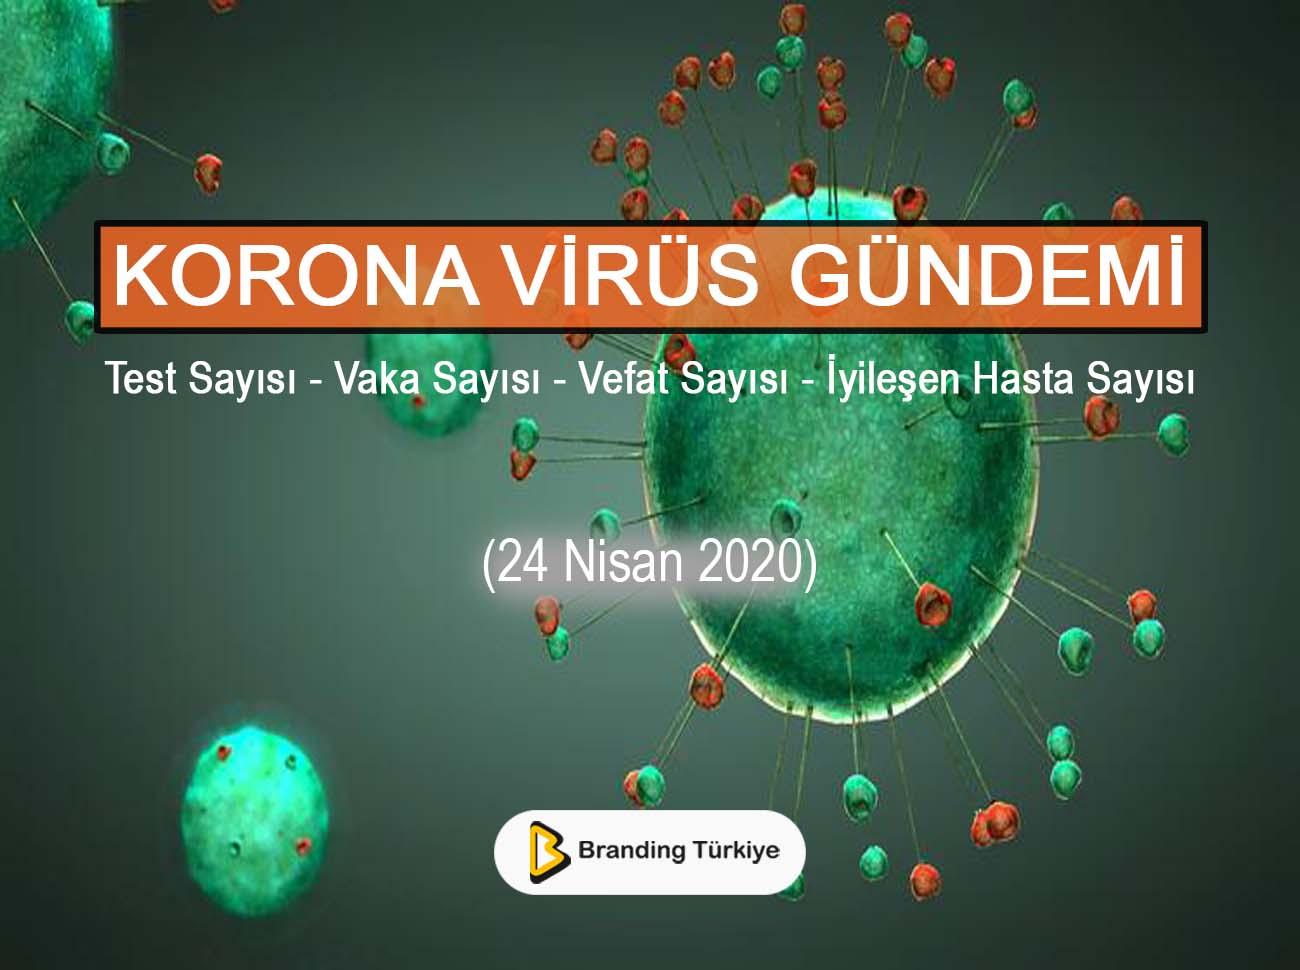 Korona Virüs Gündemi (24 Nisan 2020)